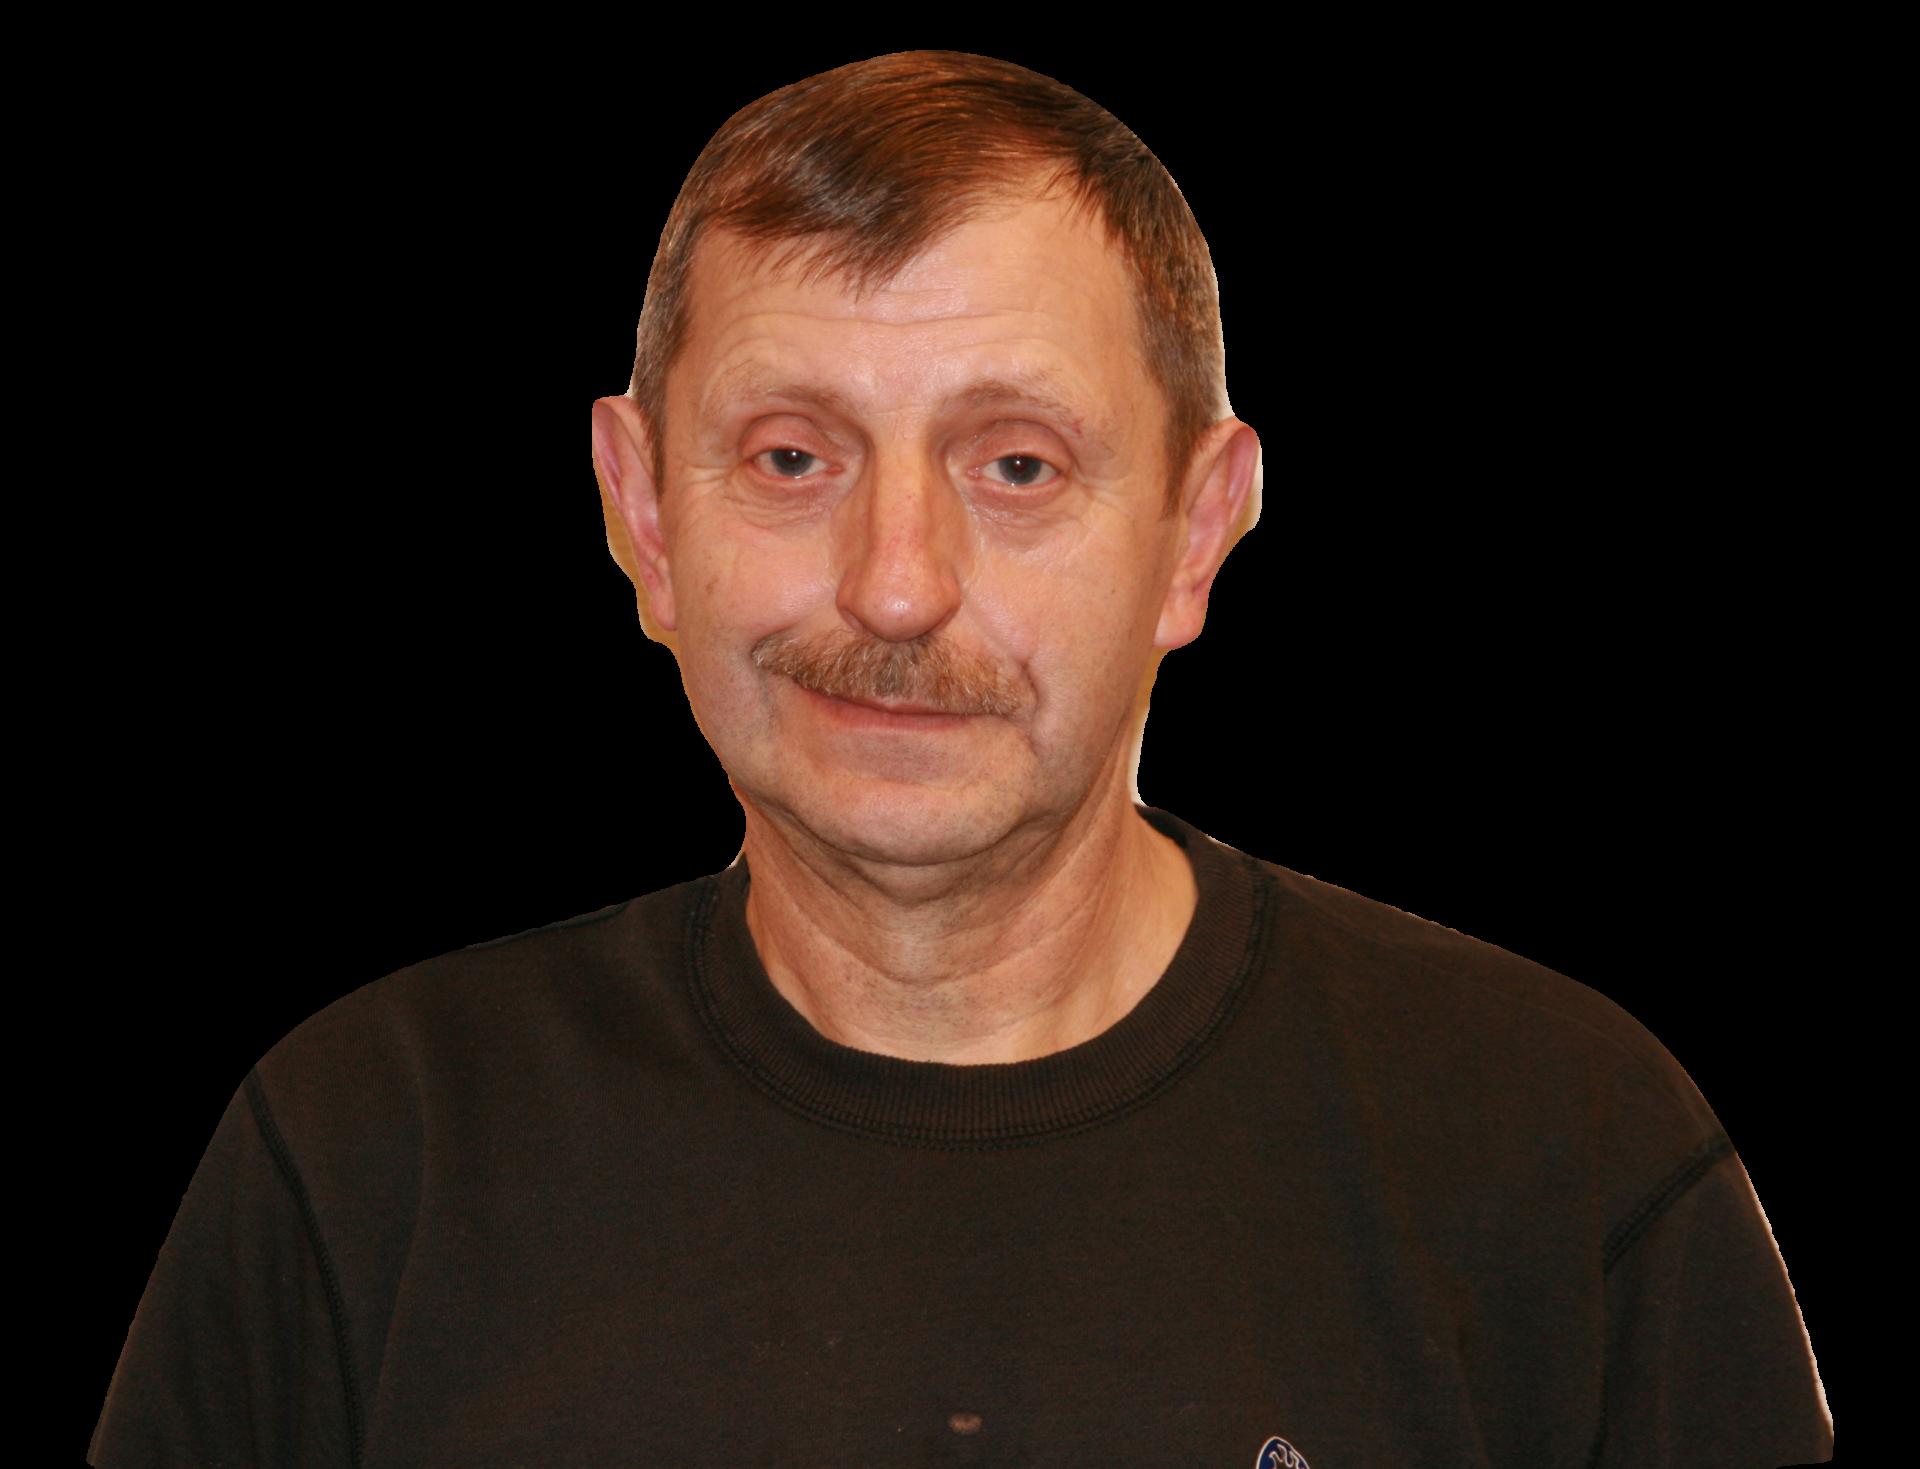 Wladyslaw Szlapka